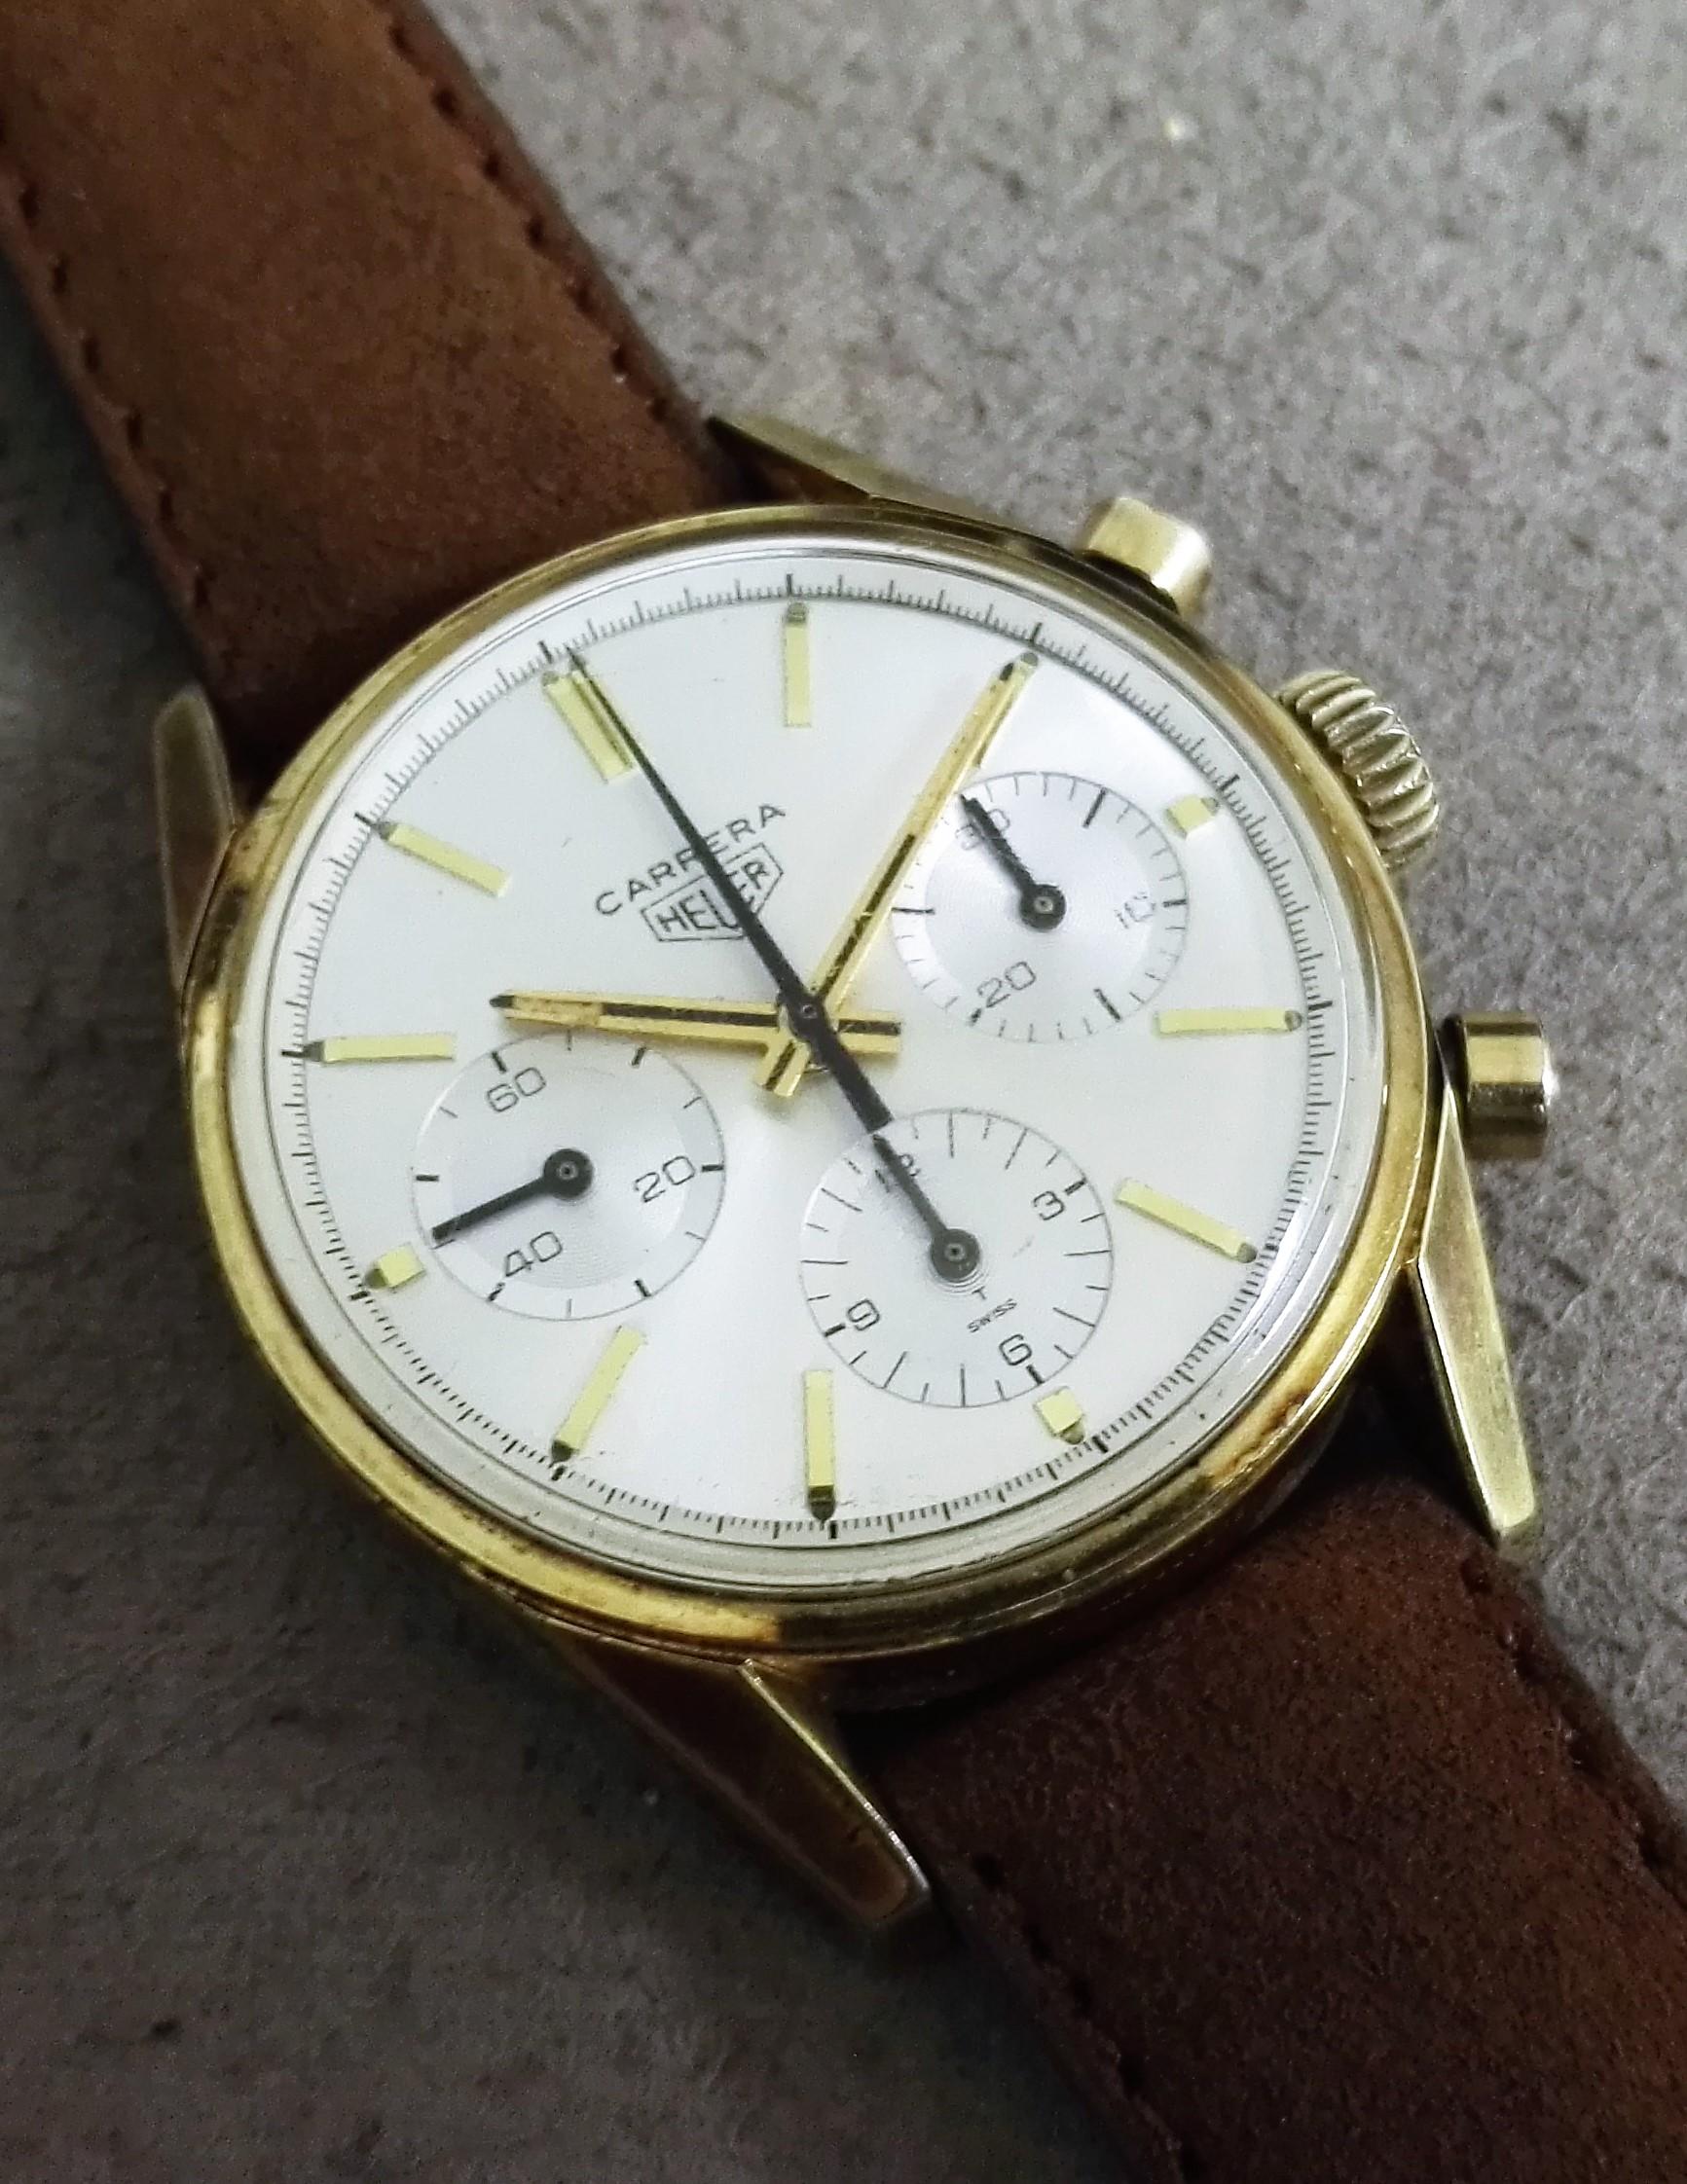 Heuer Carrera Cronograph Ref. 2448 Long Index - Valjoux 72 | San Giorgio a Cremano